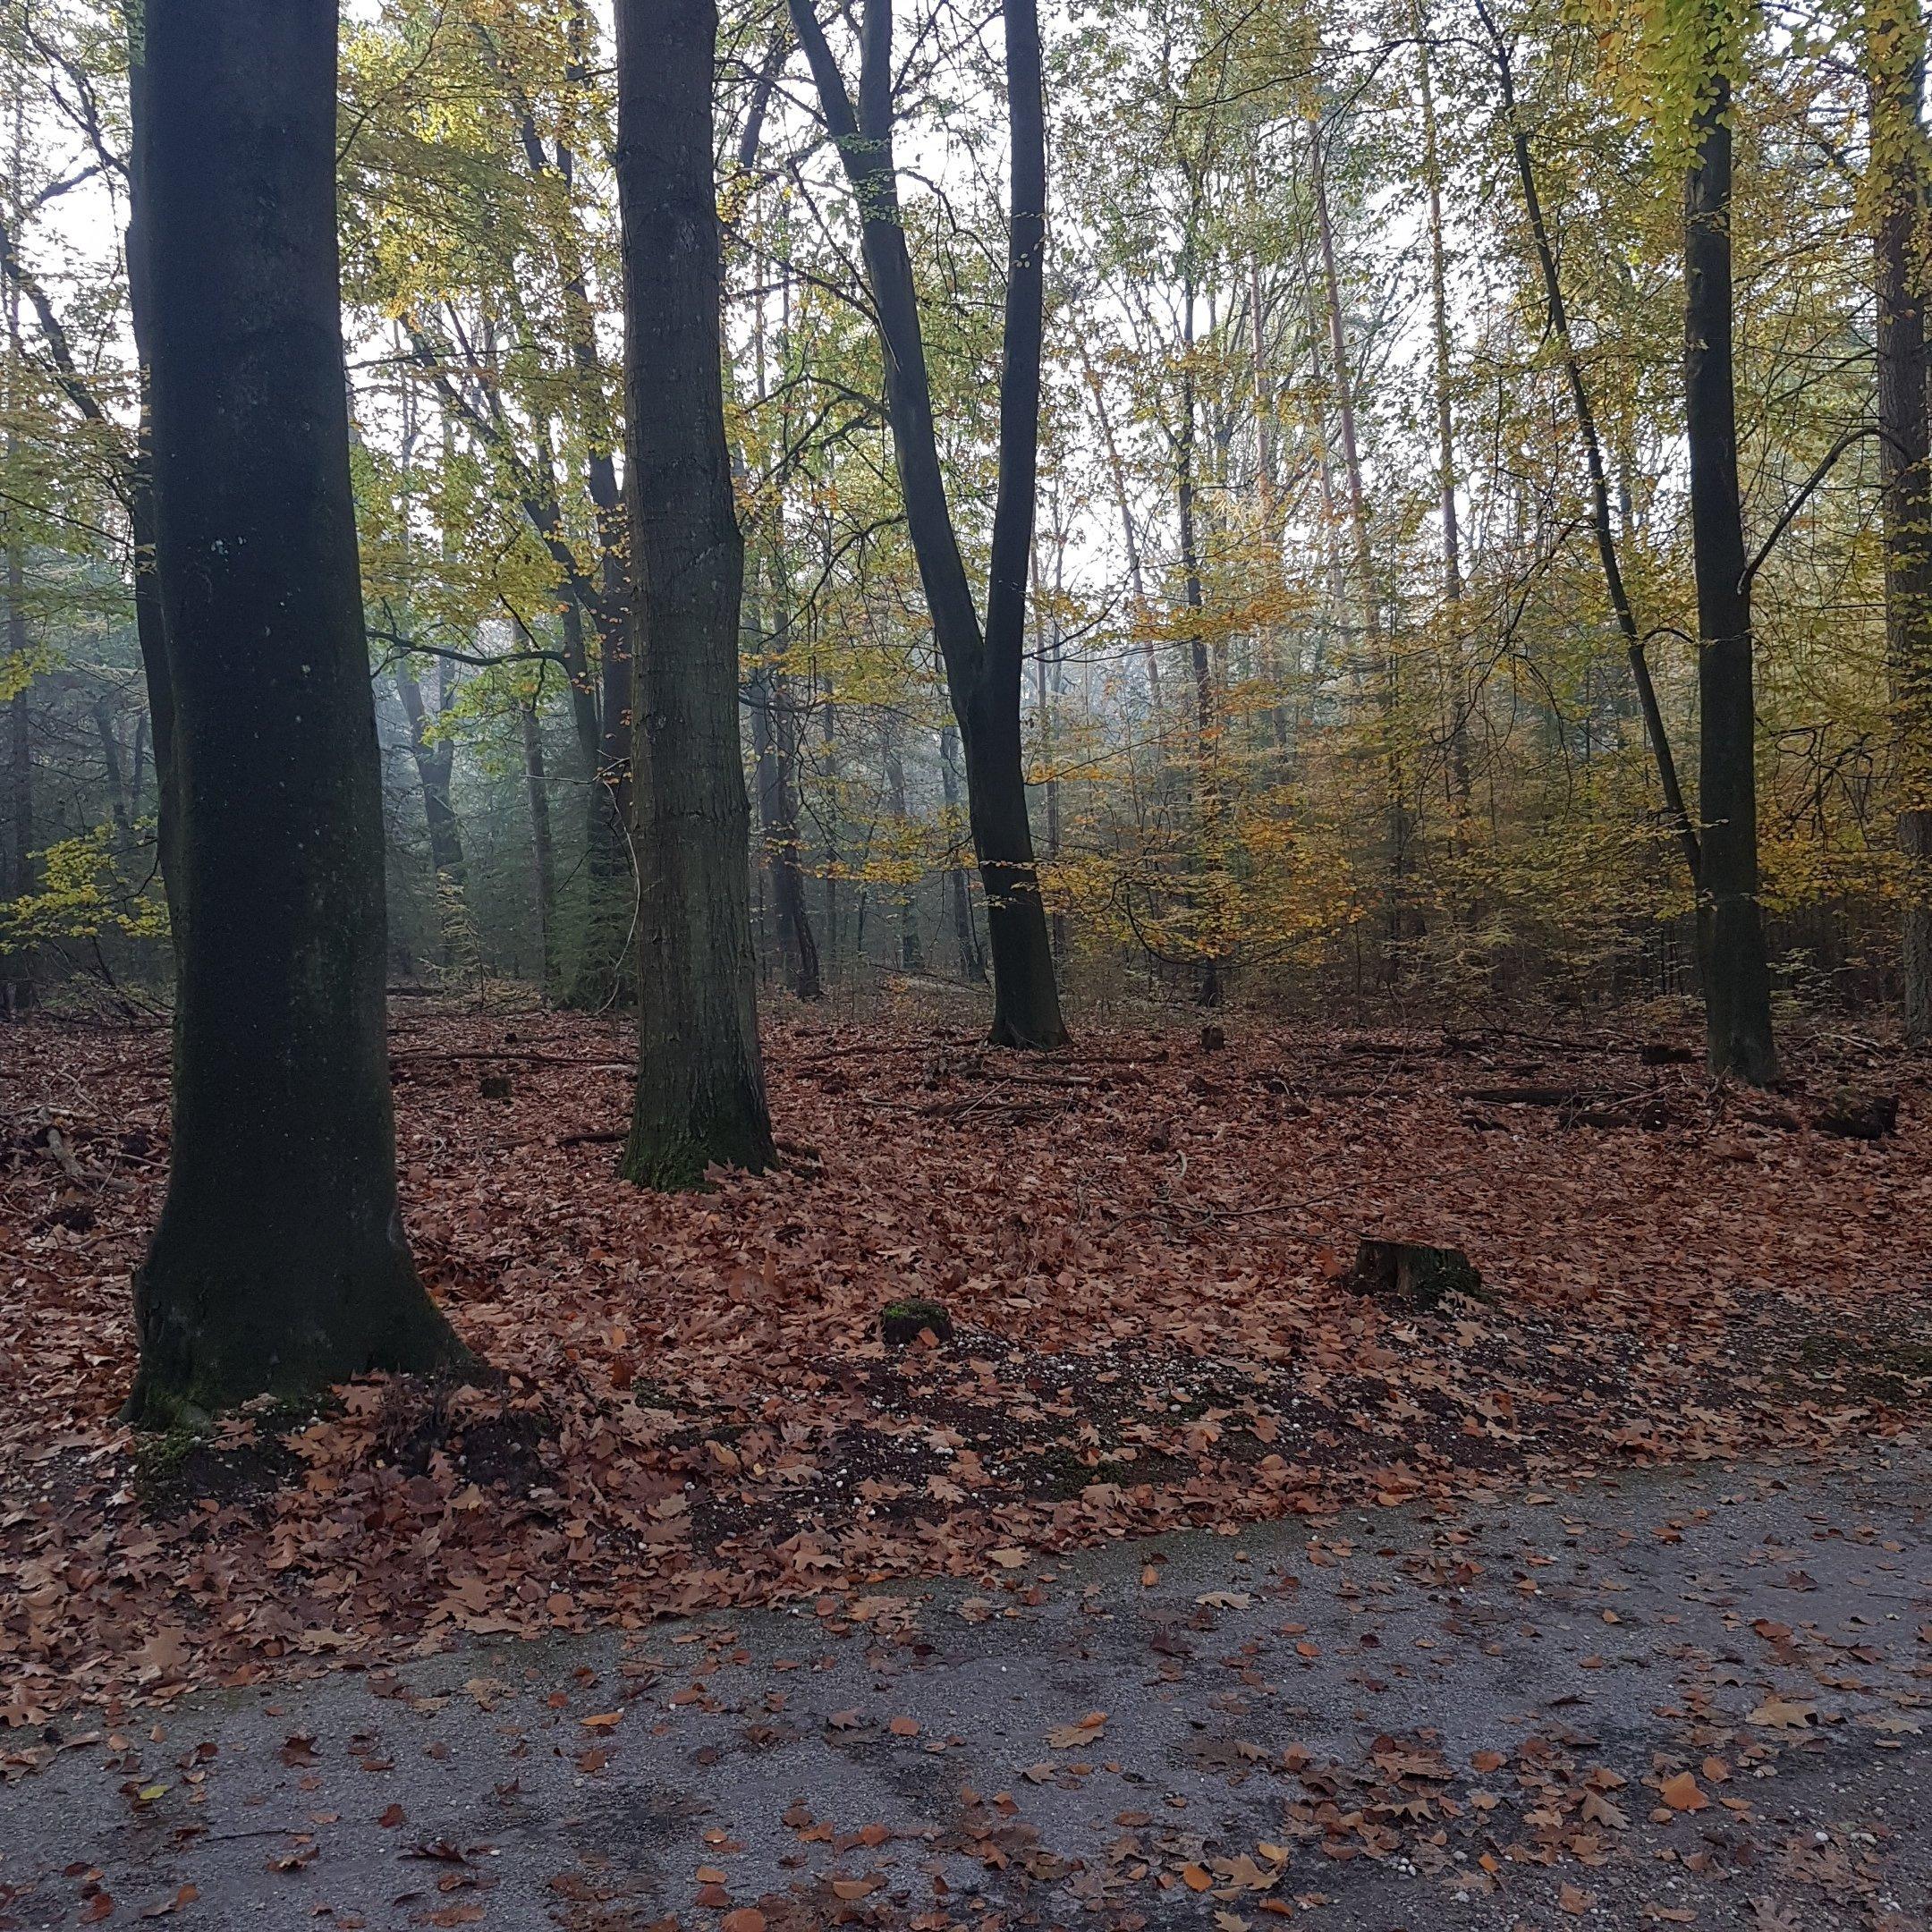 The autumn scenery in Veluwe - itstartswithacoffee.com #geocache #geocaching #geocachingNL #geocachingNetherlands #geocachingfun #Veluwe